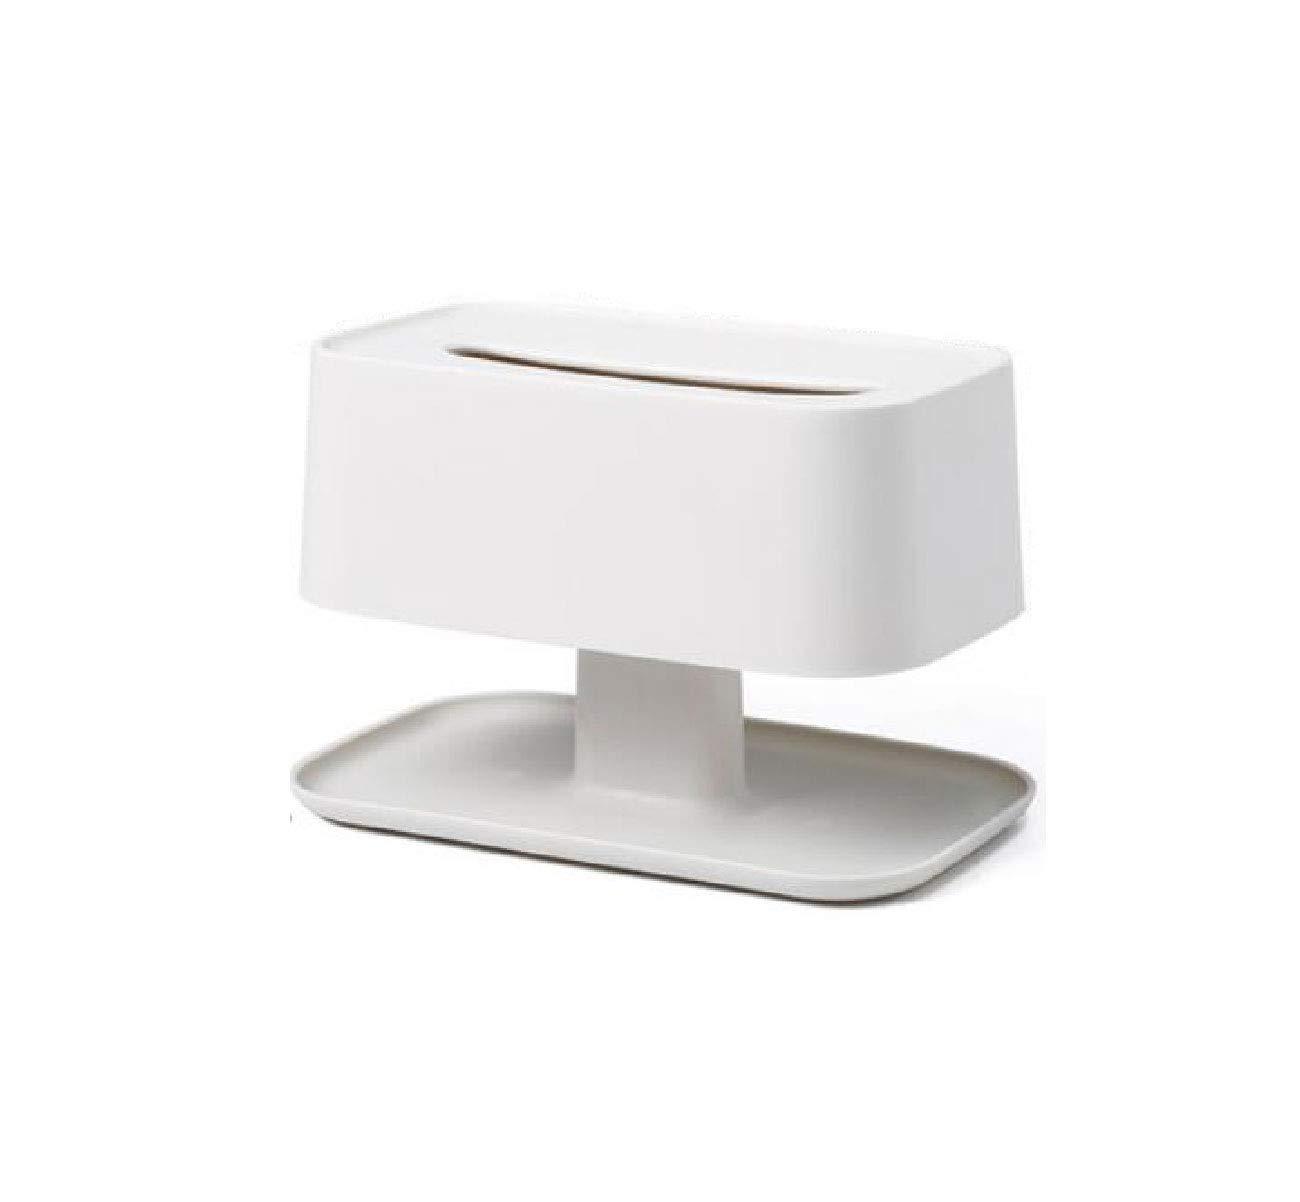 Trutyii Multi-Function Tissue Box Living Room Coffee Table Paper Remote Control Storage Box Creative Simple Cute Home Home European Multi-Function Double-Layer Simple Tissue Box (Color : White)